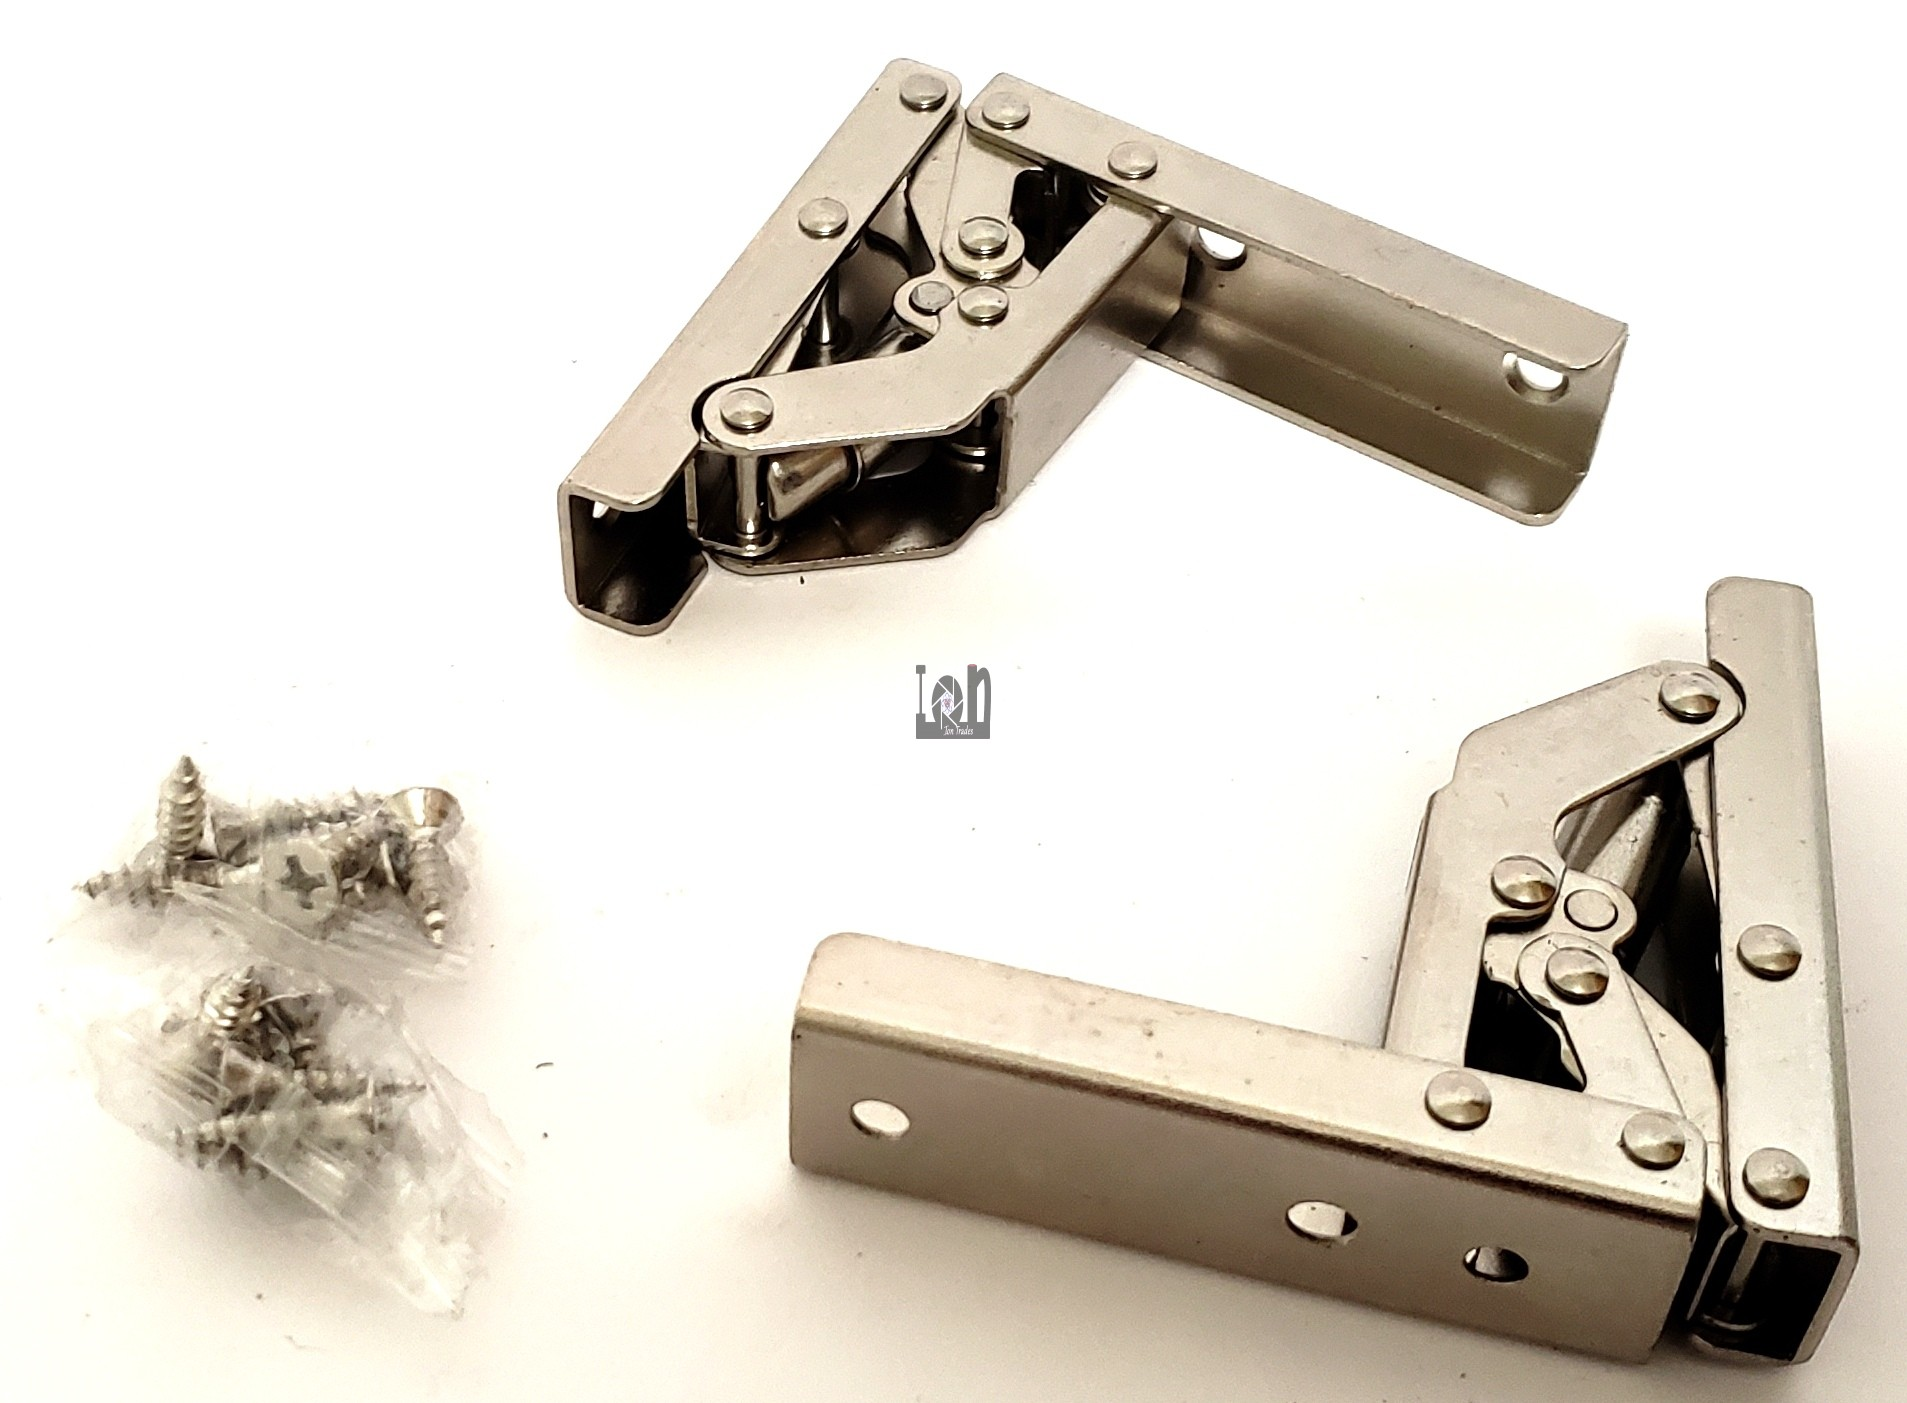 2pc 90 Degree Folding Shelf  Bracket Hinge Support 20mm x 160mm open